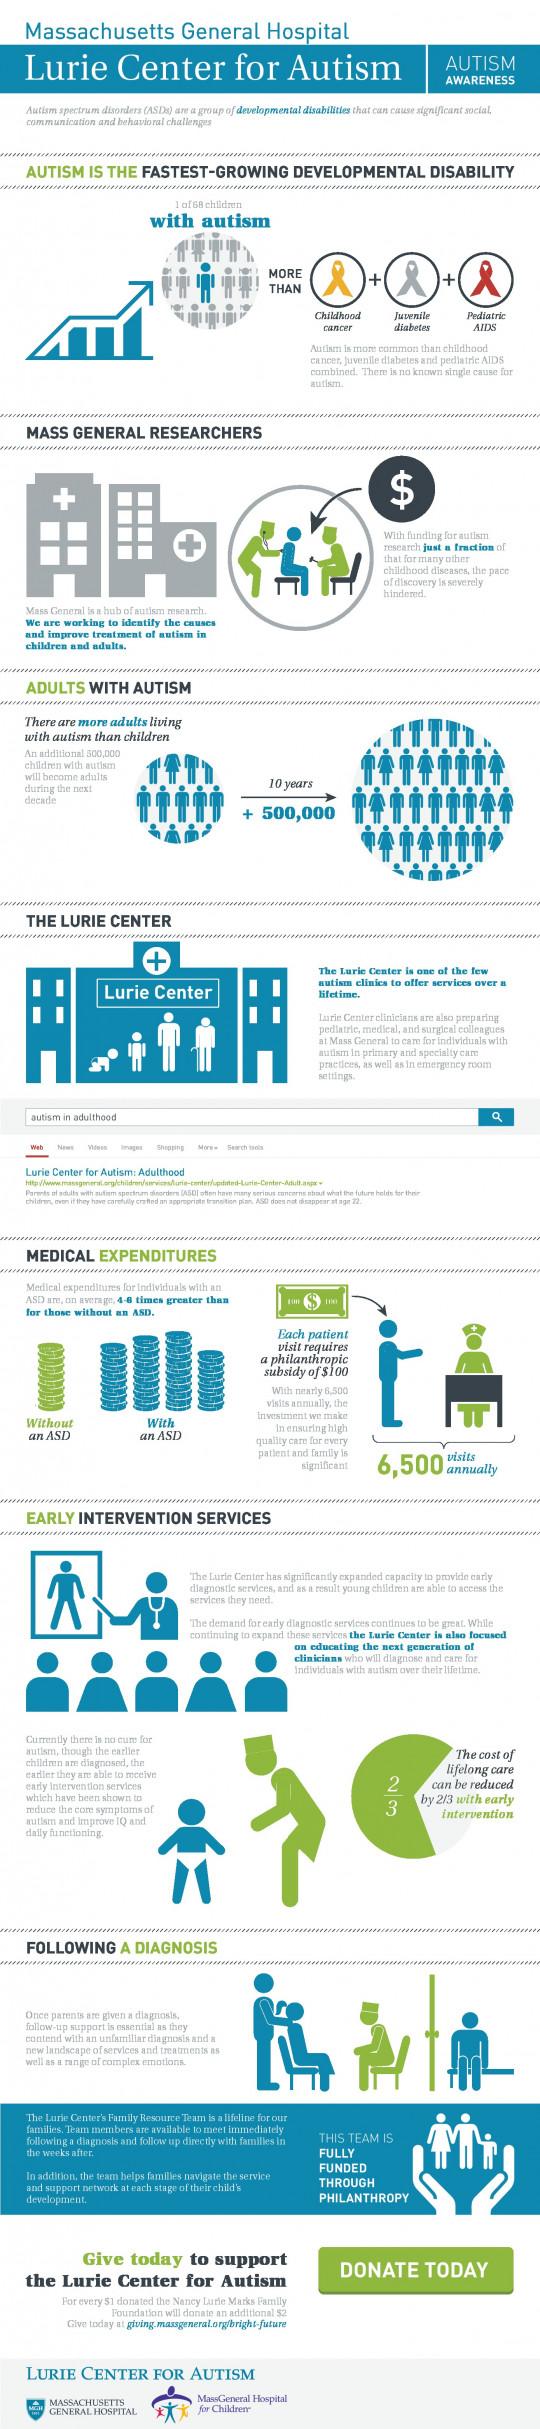 Lurie Center - Autism Awareness